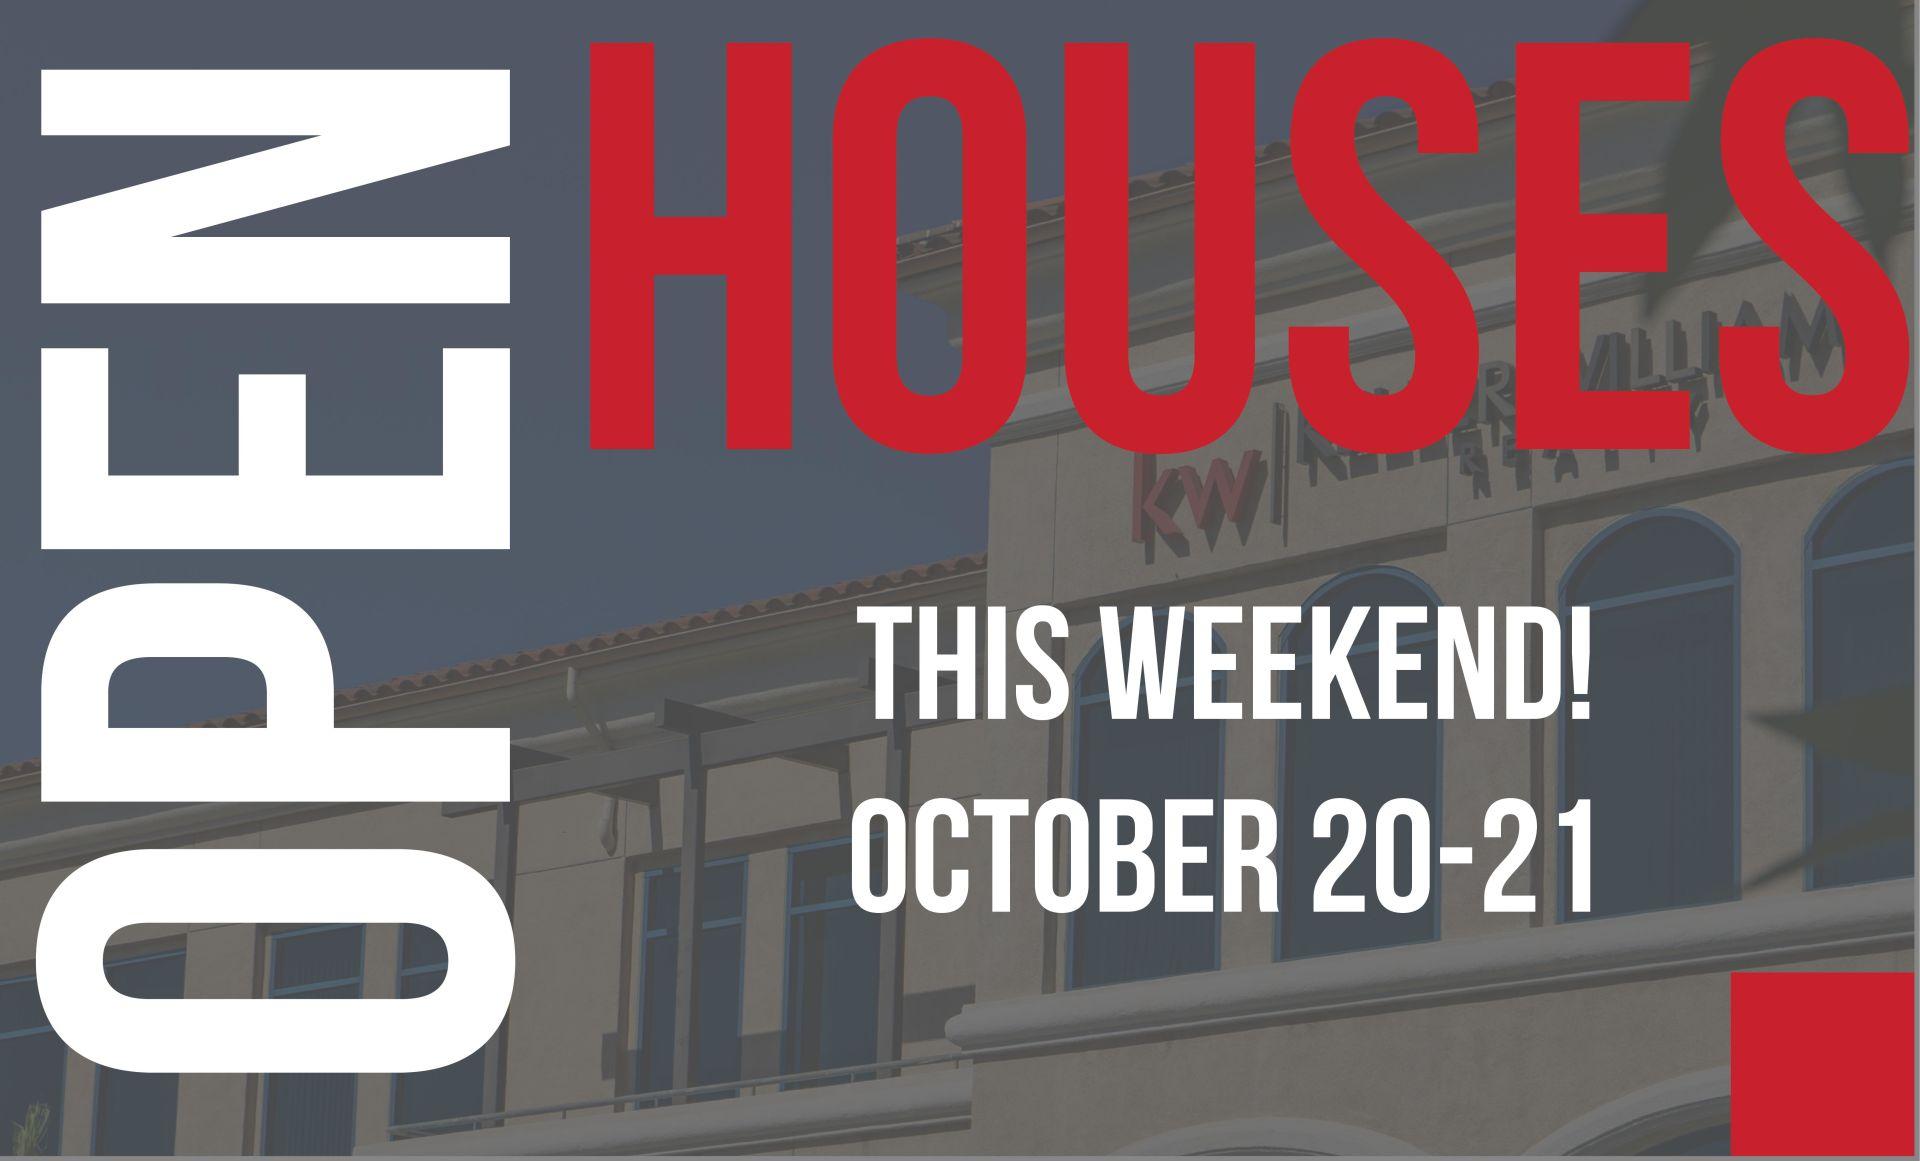 Open Houses: October 20-21 2018